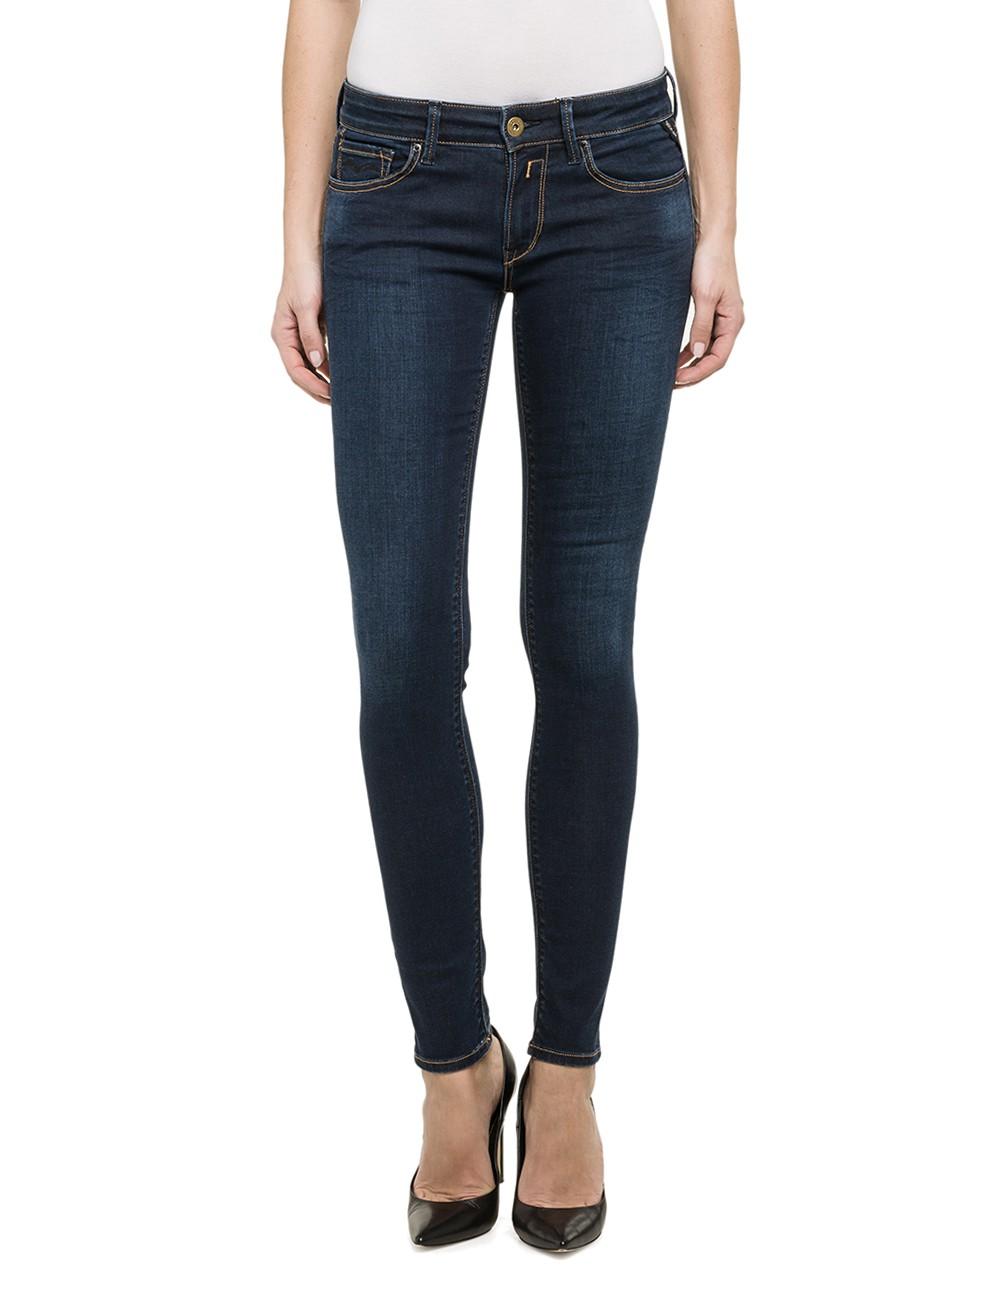 replay damen jeans luz skinny fit blue denim kaufen. Black Bedroom Furniture Sets. Home Design Ideas